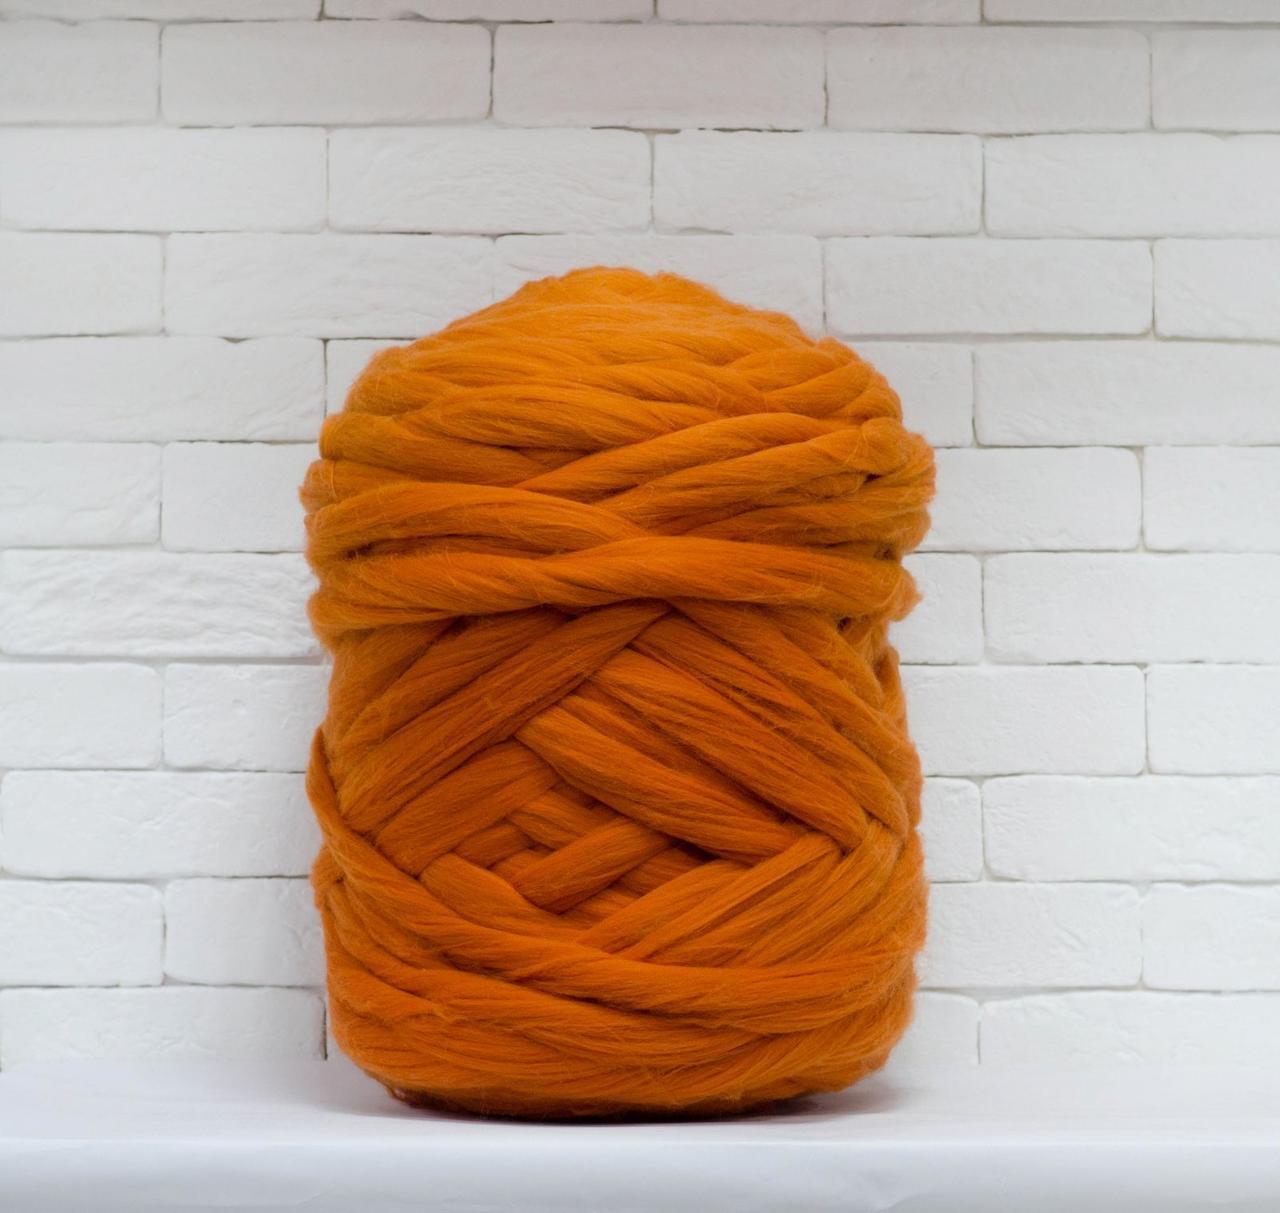 Товста, велика пряжа 100% вовна мериноса. Колір: Морквяний 21-23 мкрн. Топсі.